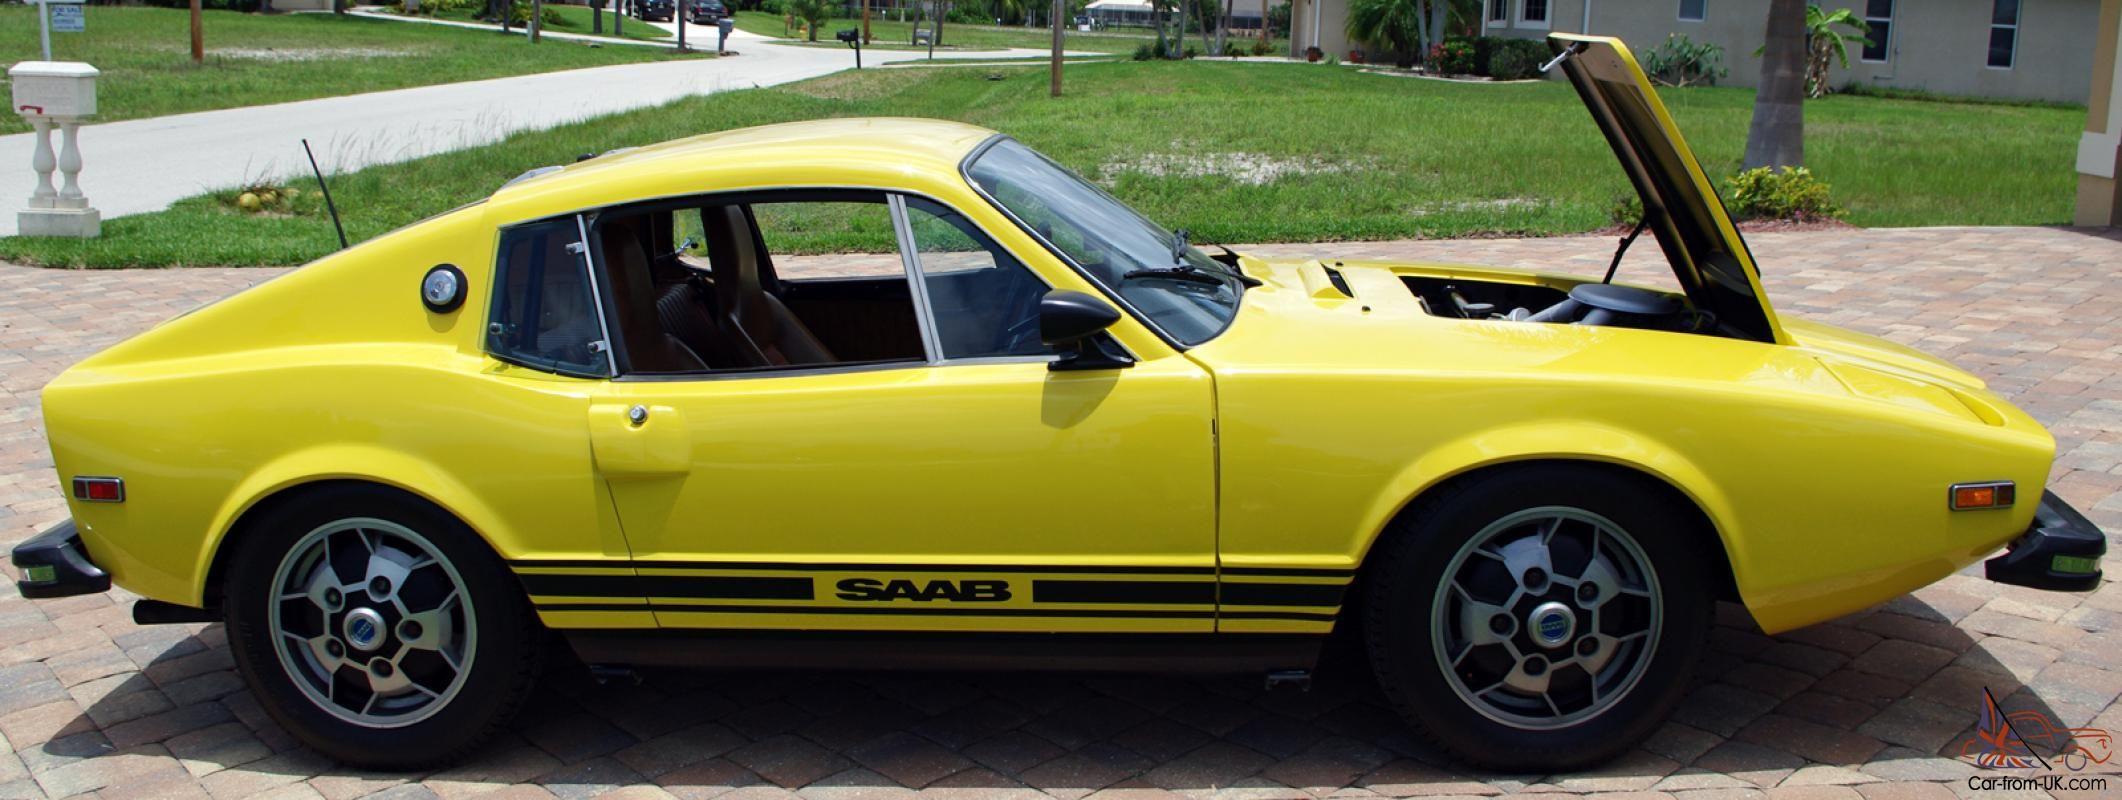 Wonderful Vintage Sport Cars For Sale Images - Classic Cars Ideas ...